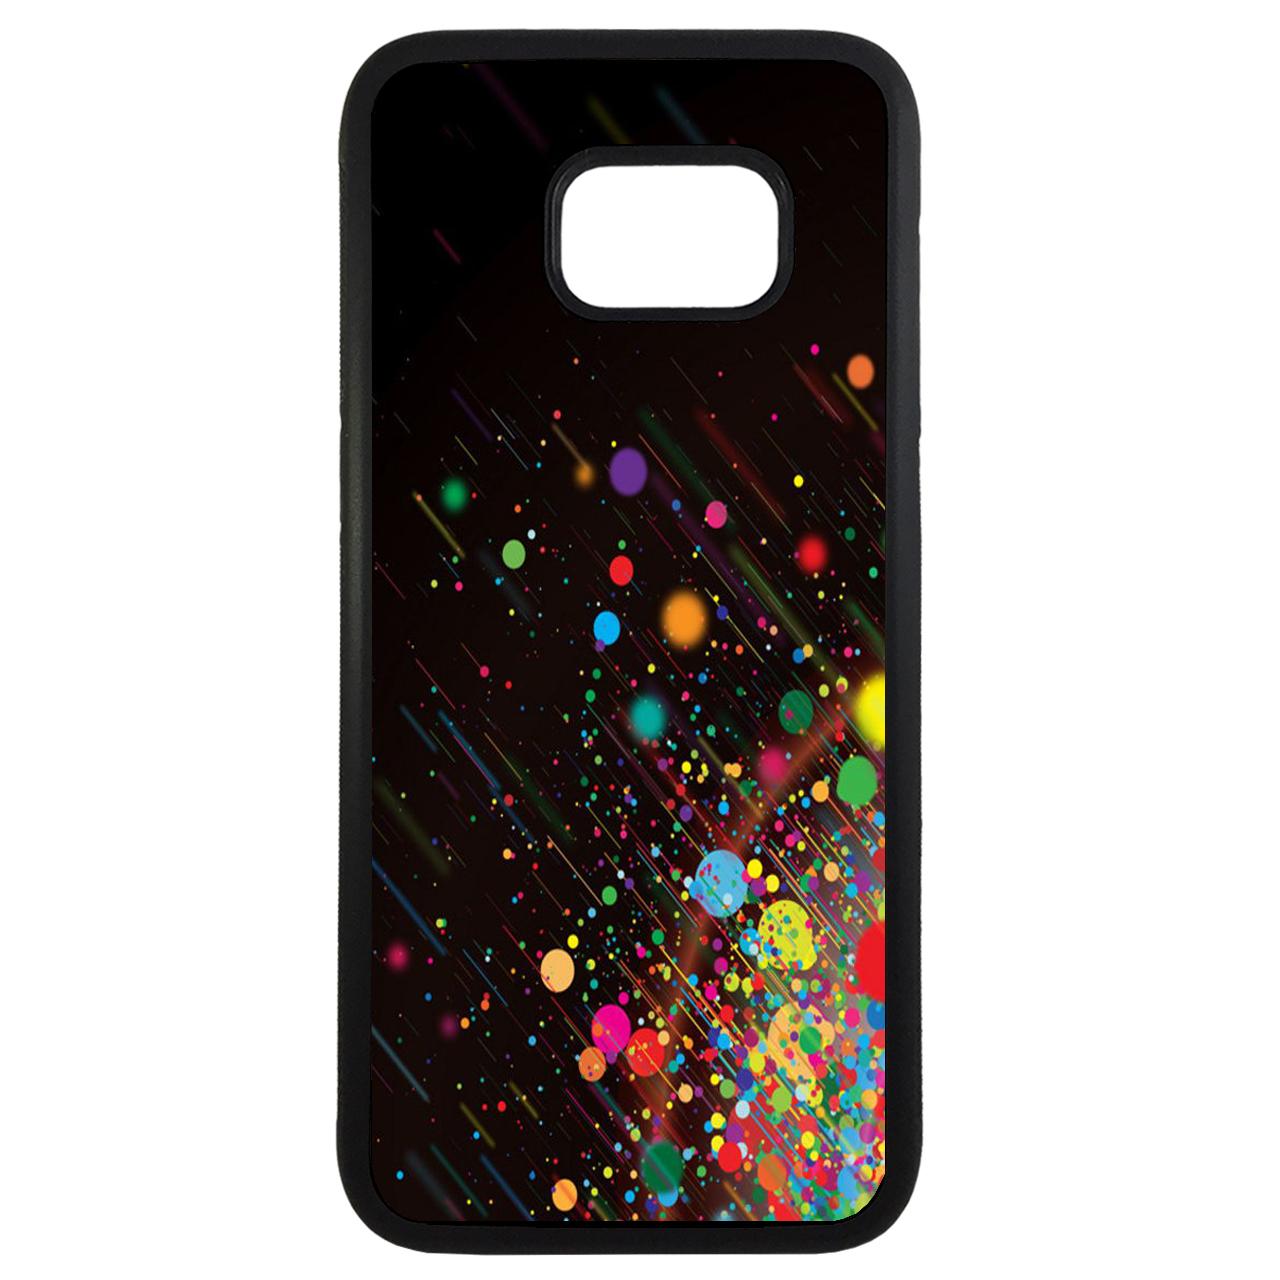 کاور طرح رنگارنگ کد 11054094224 مناسب برای گوشی موبایل سامسونگ galaxy s7 edge